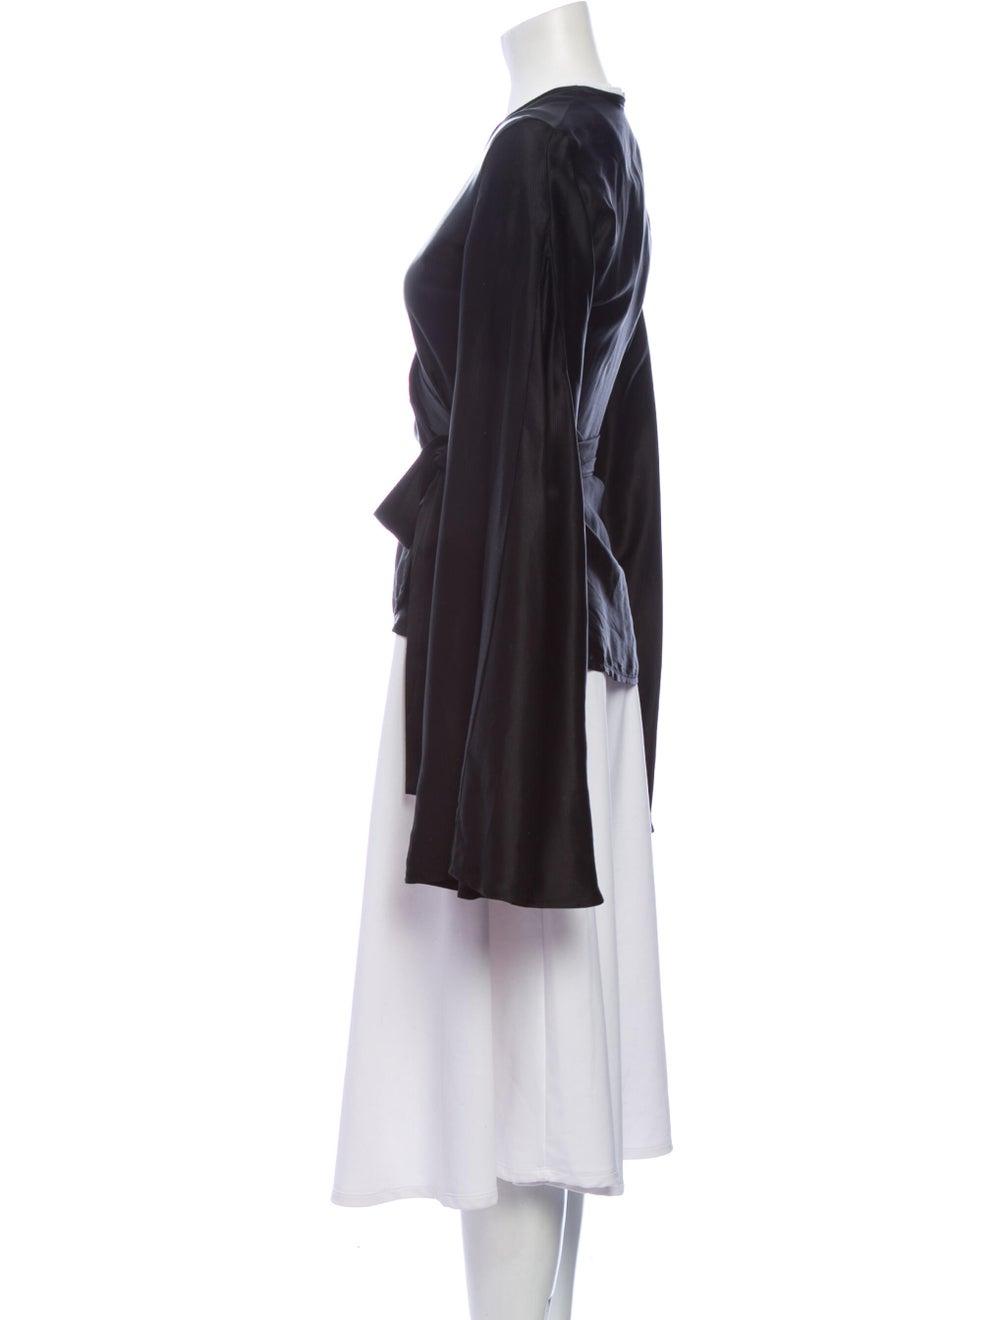 Beaufille V-Neck Long Sleeve Blouse Black - image 2